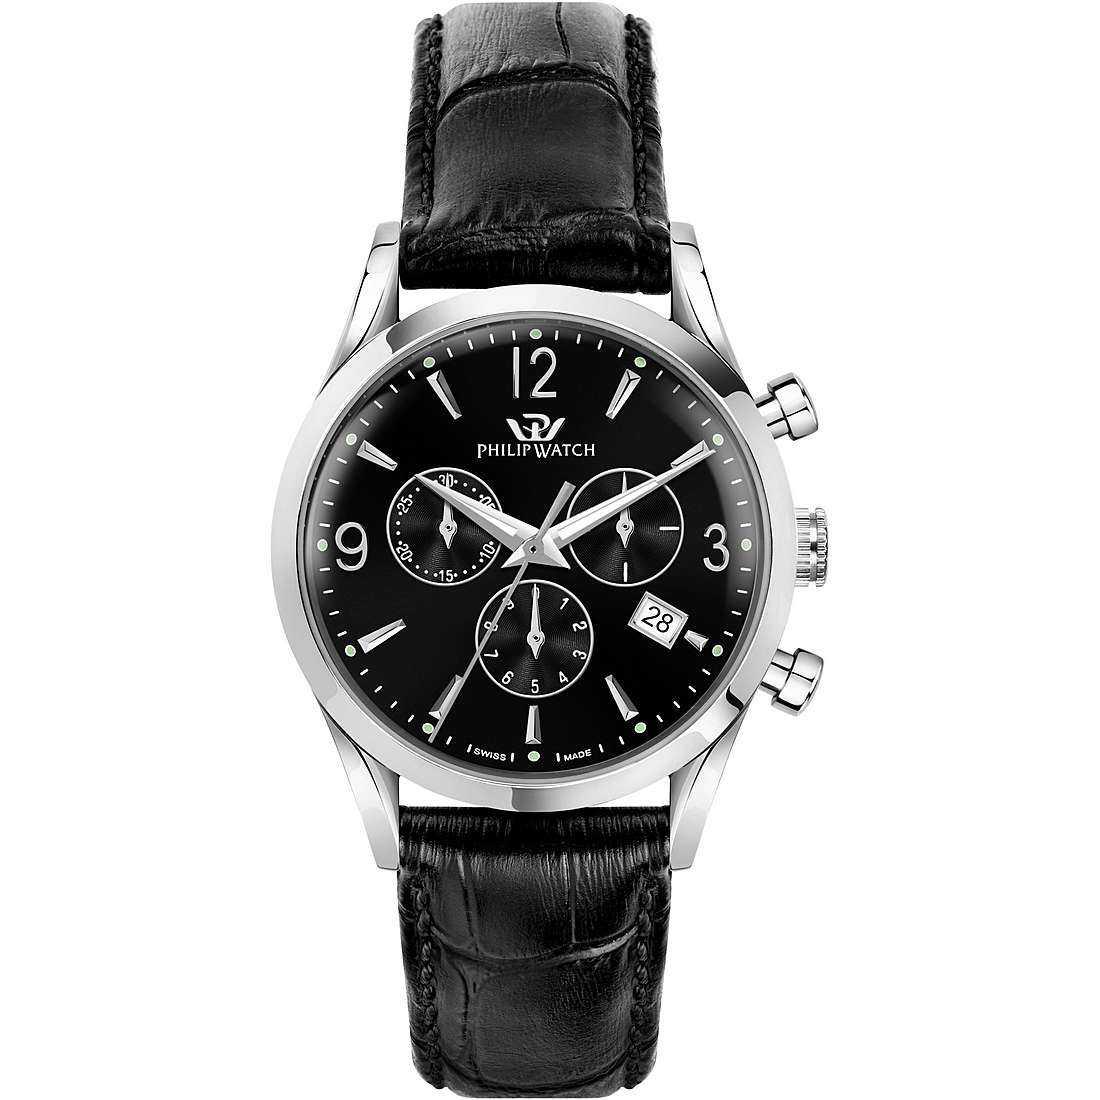 Orologio philip watch r8271680002